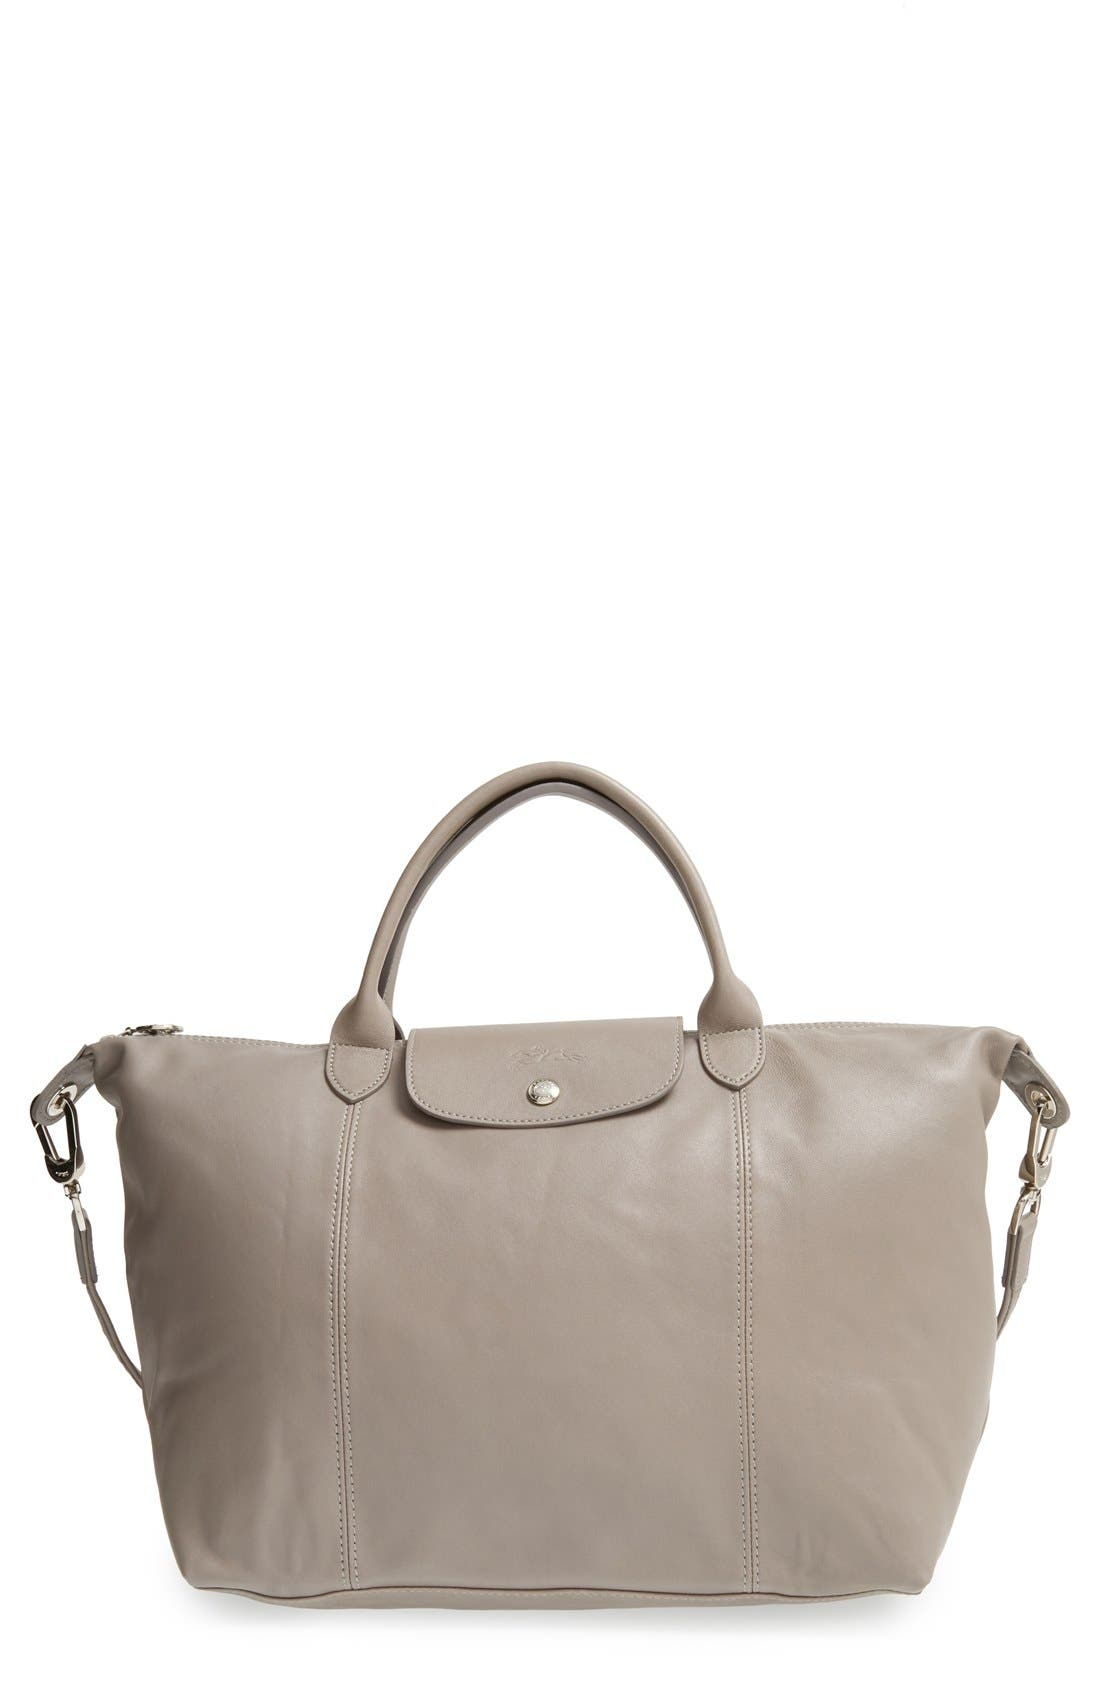 Longchamp Medium 'Le Pliage Cuir' Leather Top Handle Tote